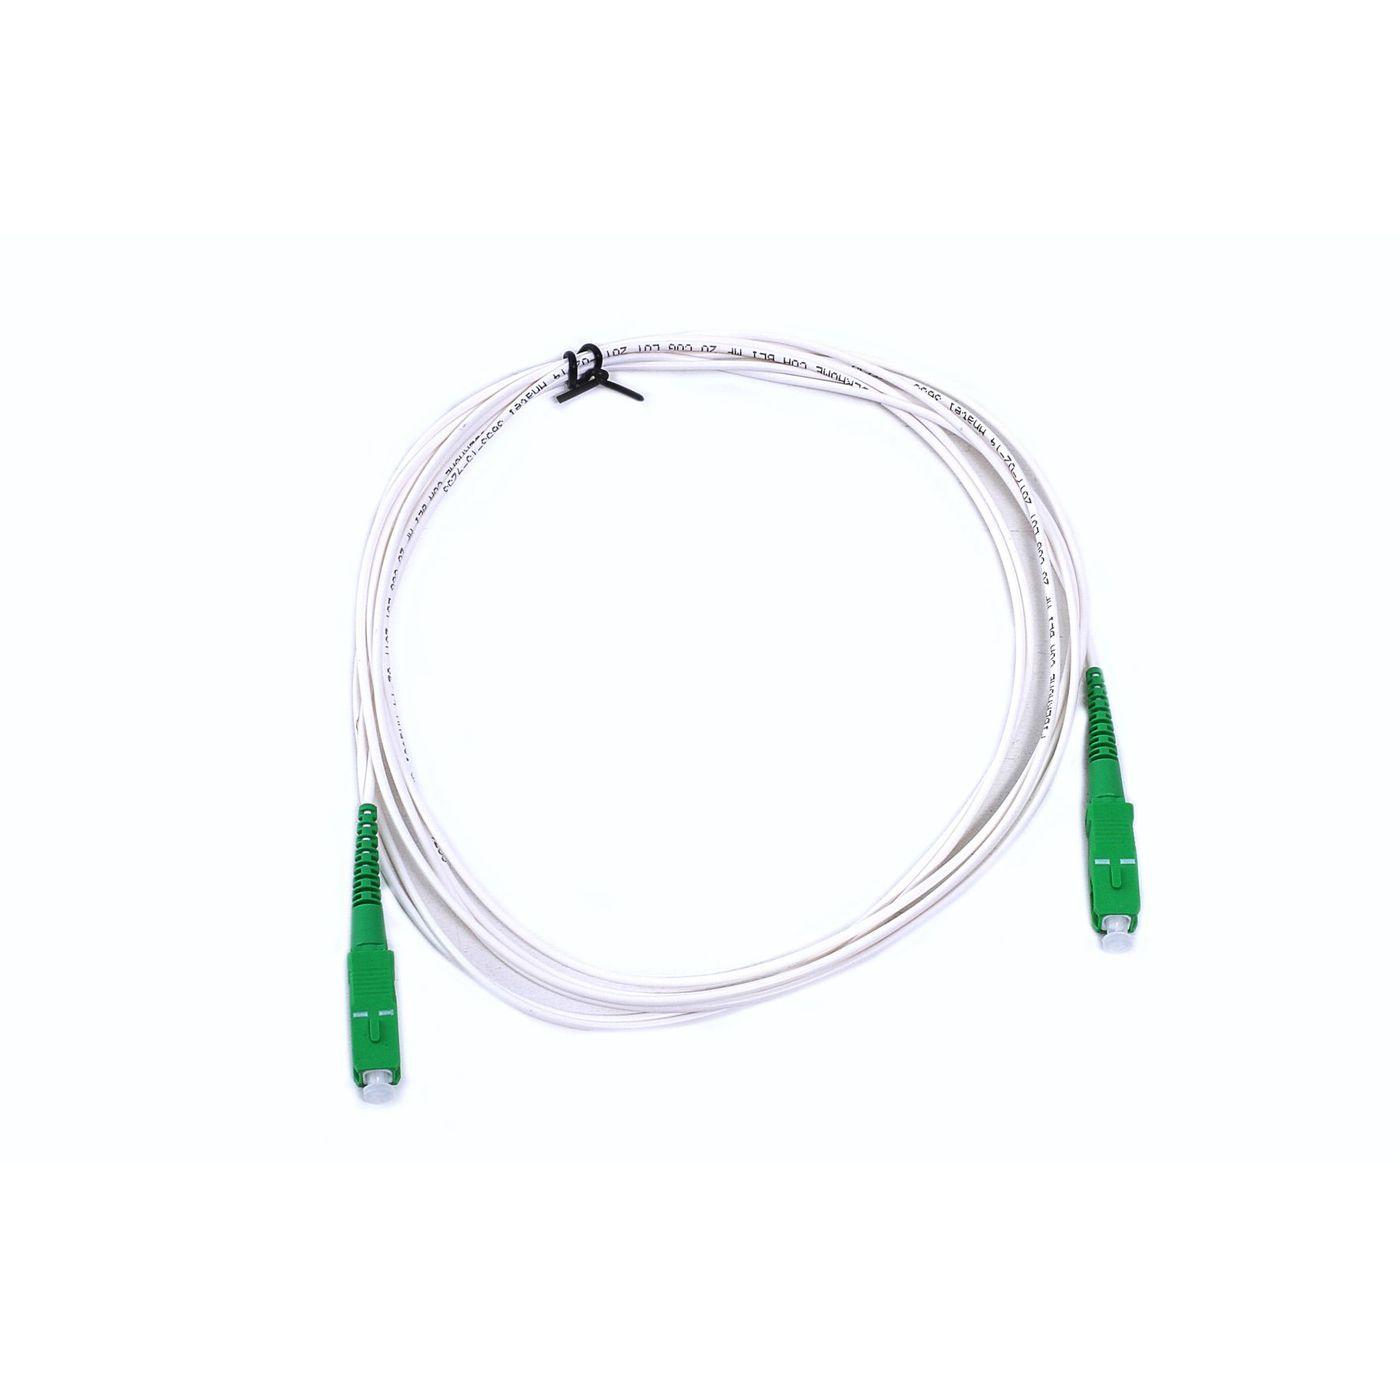 Cordão Óptico - SC/APC-SC/APC - 3 metros